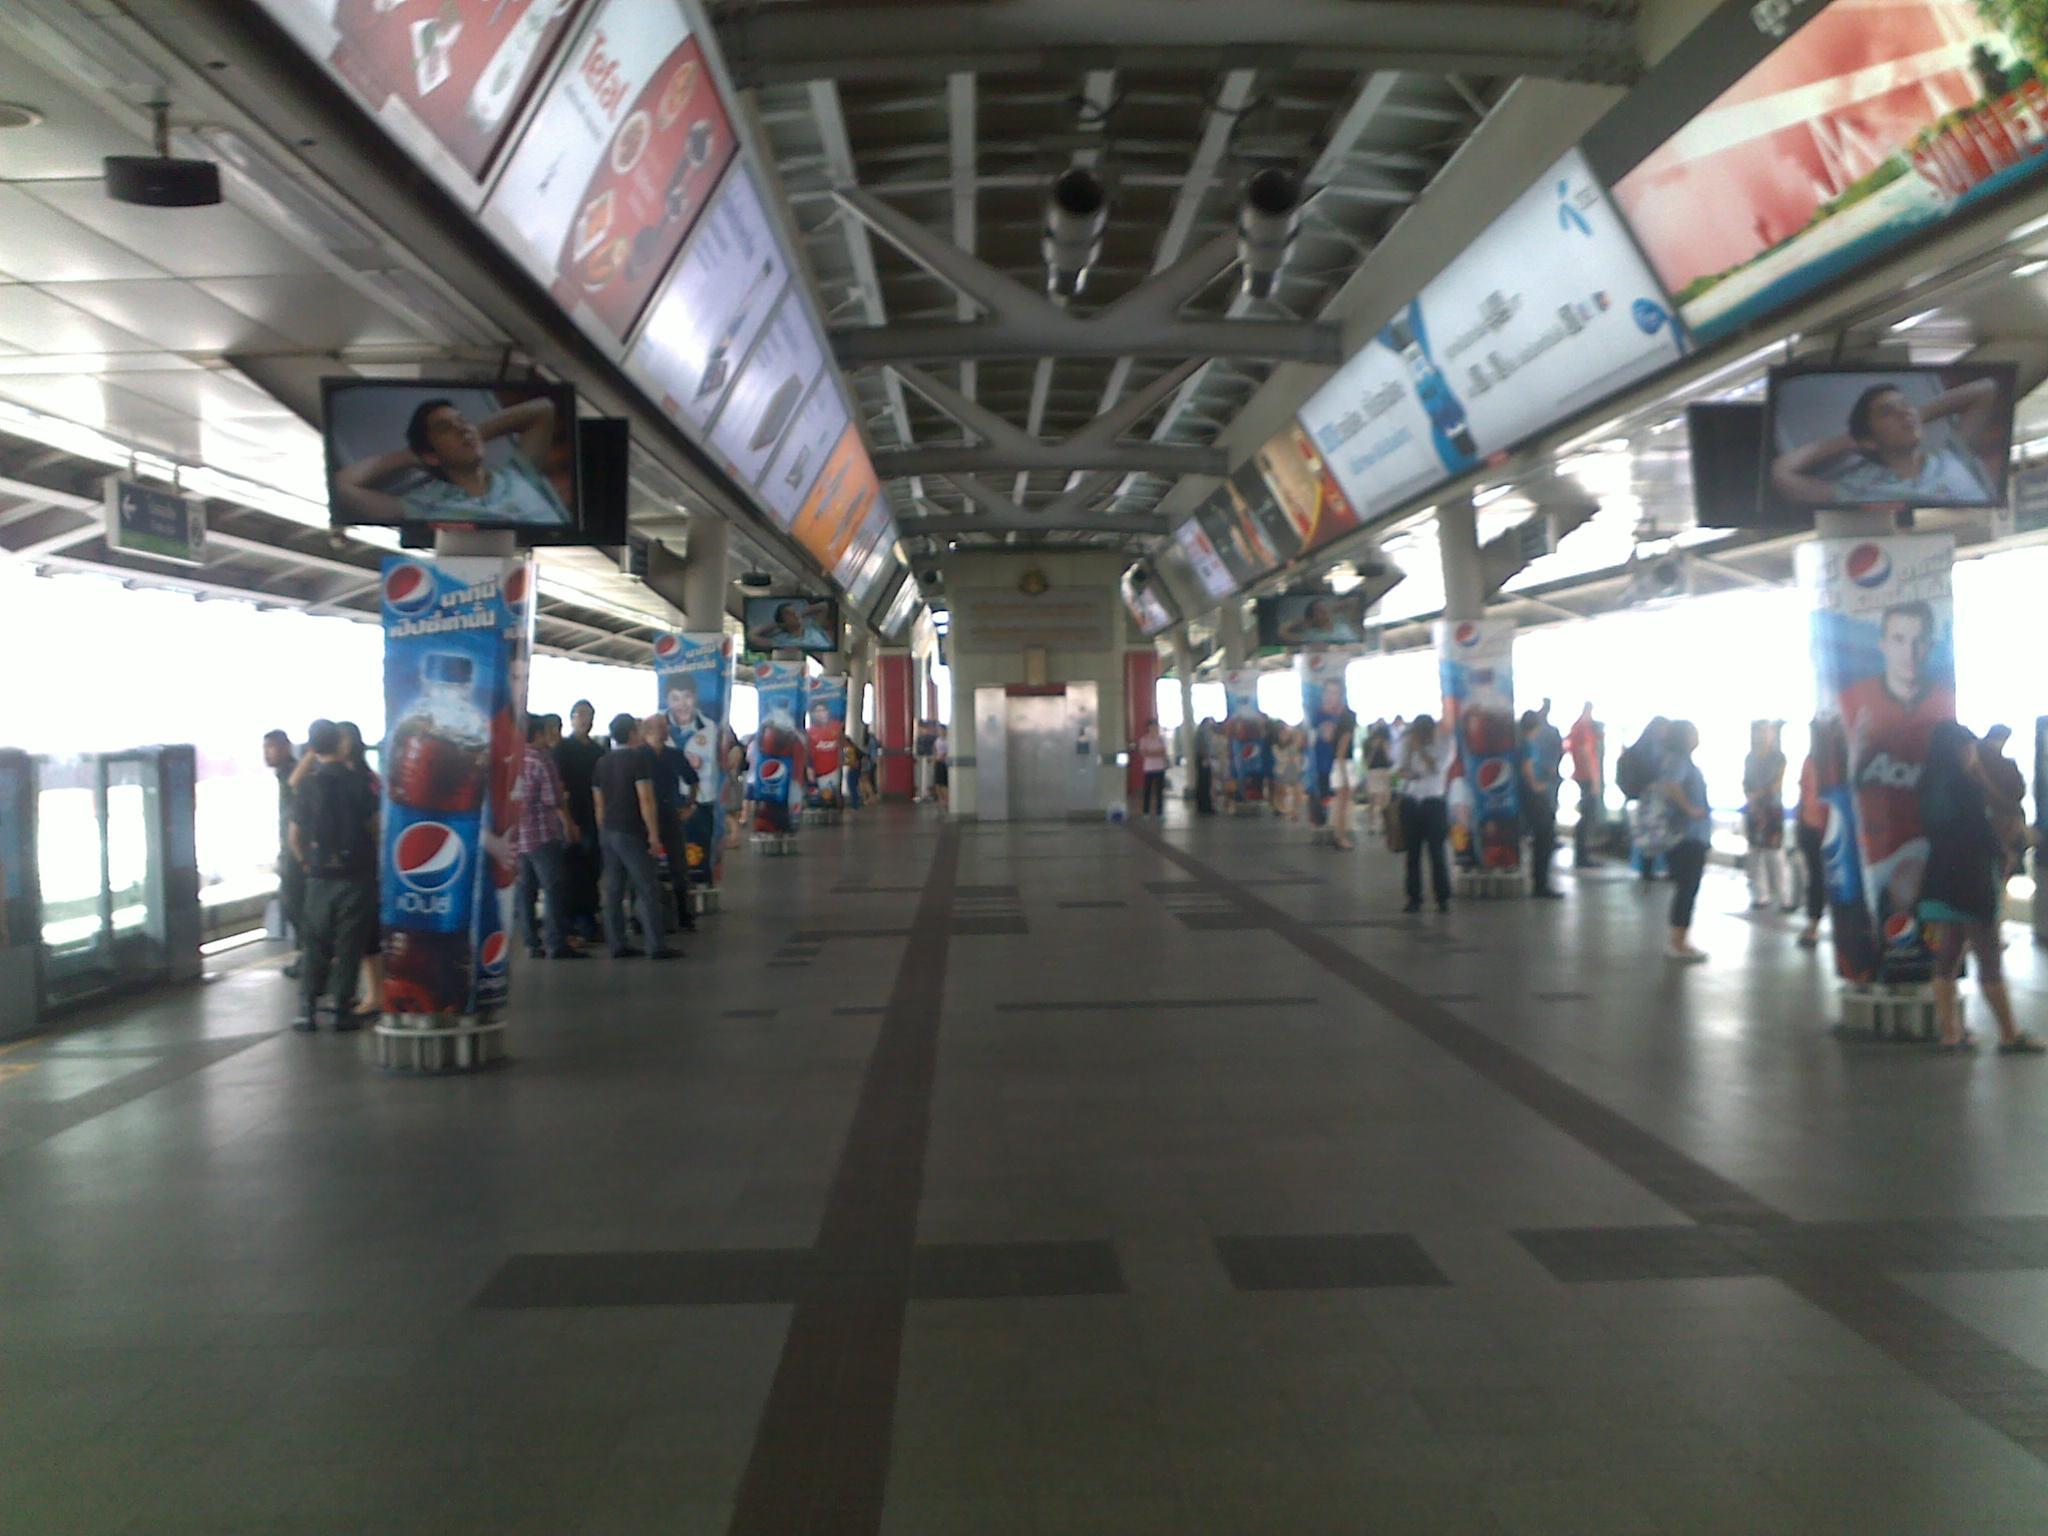 Jalan-jalan ke Bangkok (Bagian 3): Mencoba Naik Skytrain